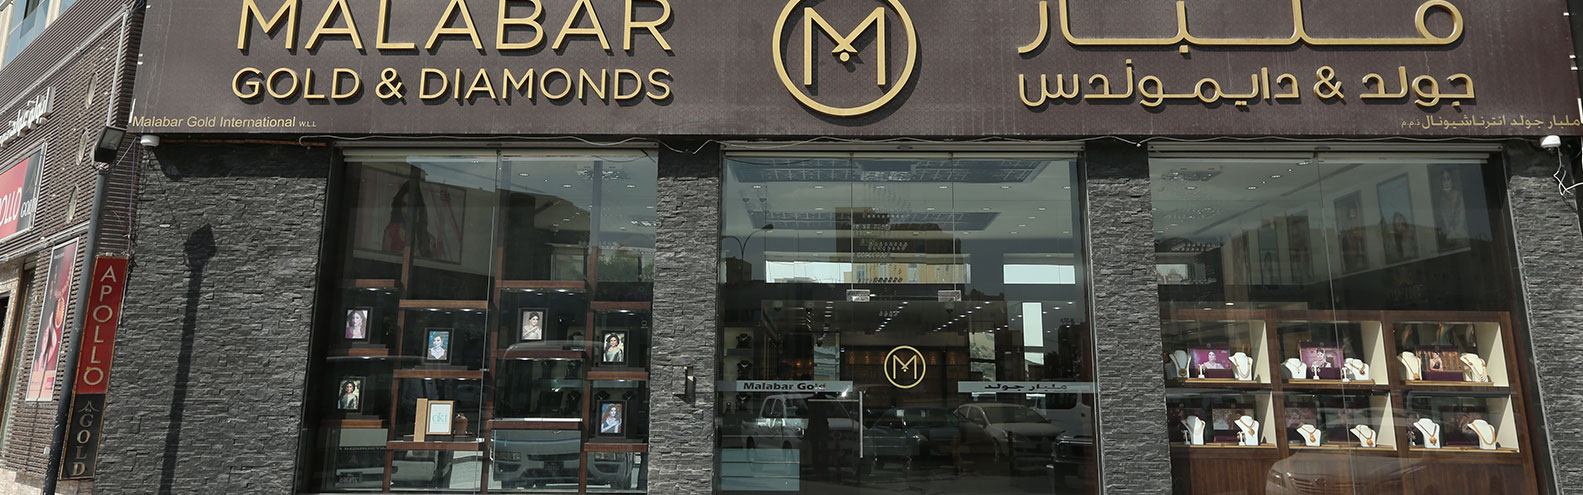 Malabar Gold & Diamonds Stores in Doha, Doha